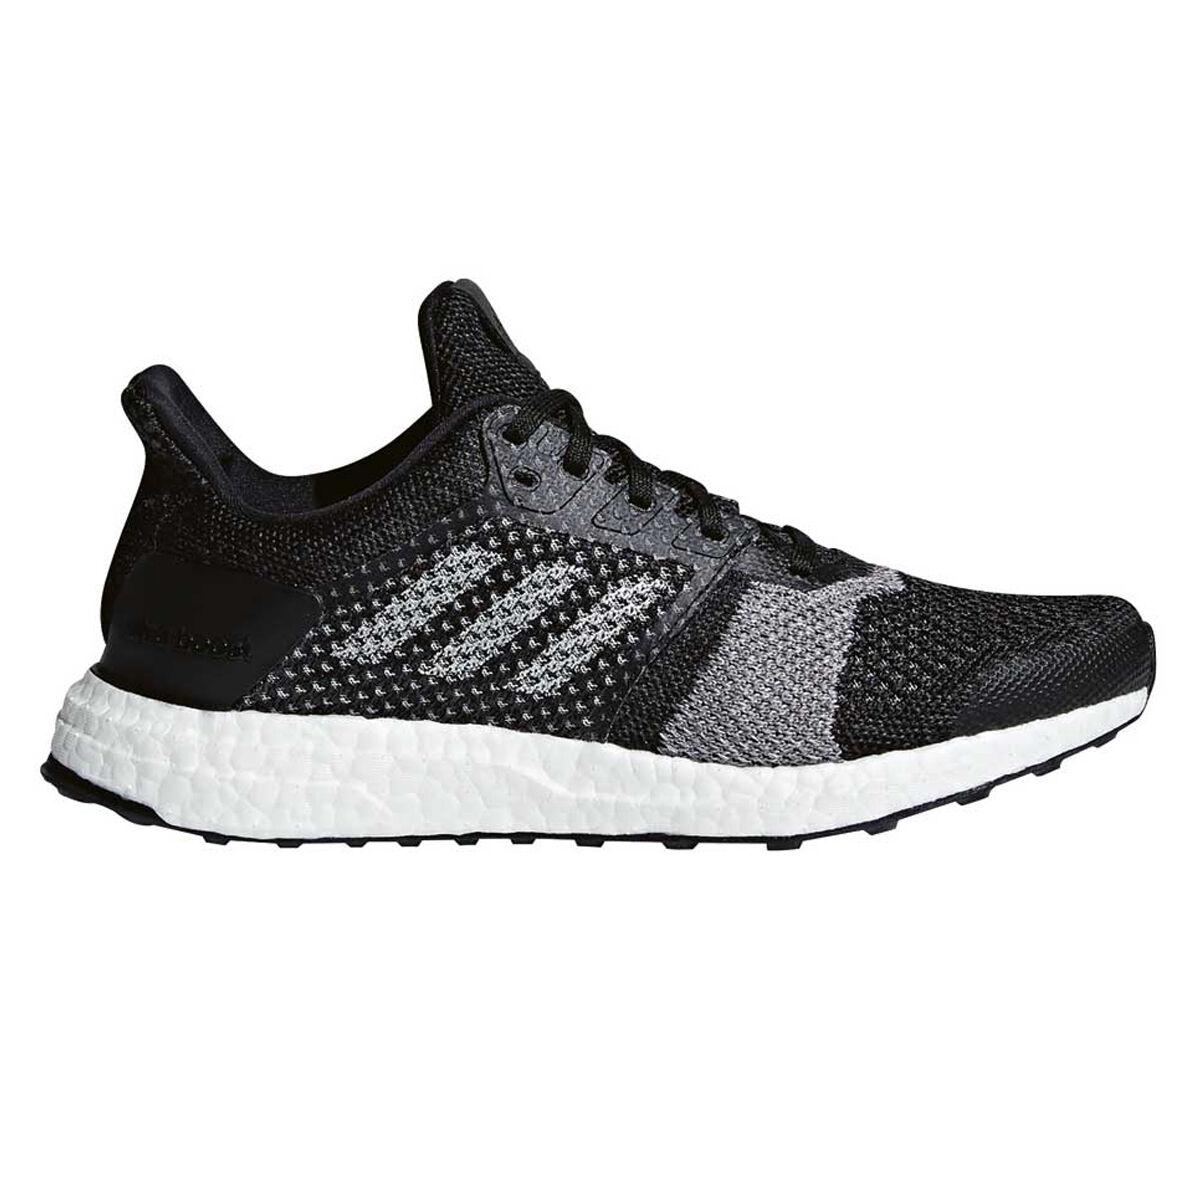 Adidas Ultra Boost ST Women's Running Shoes, Pink at John